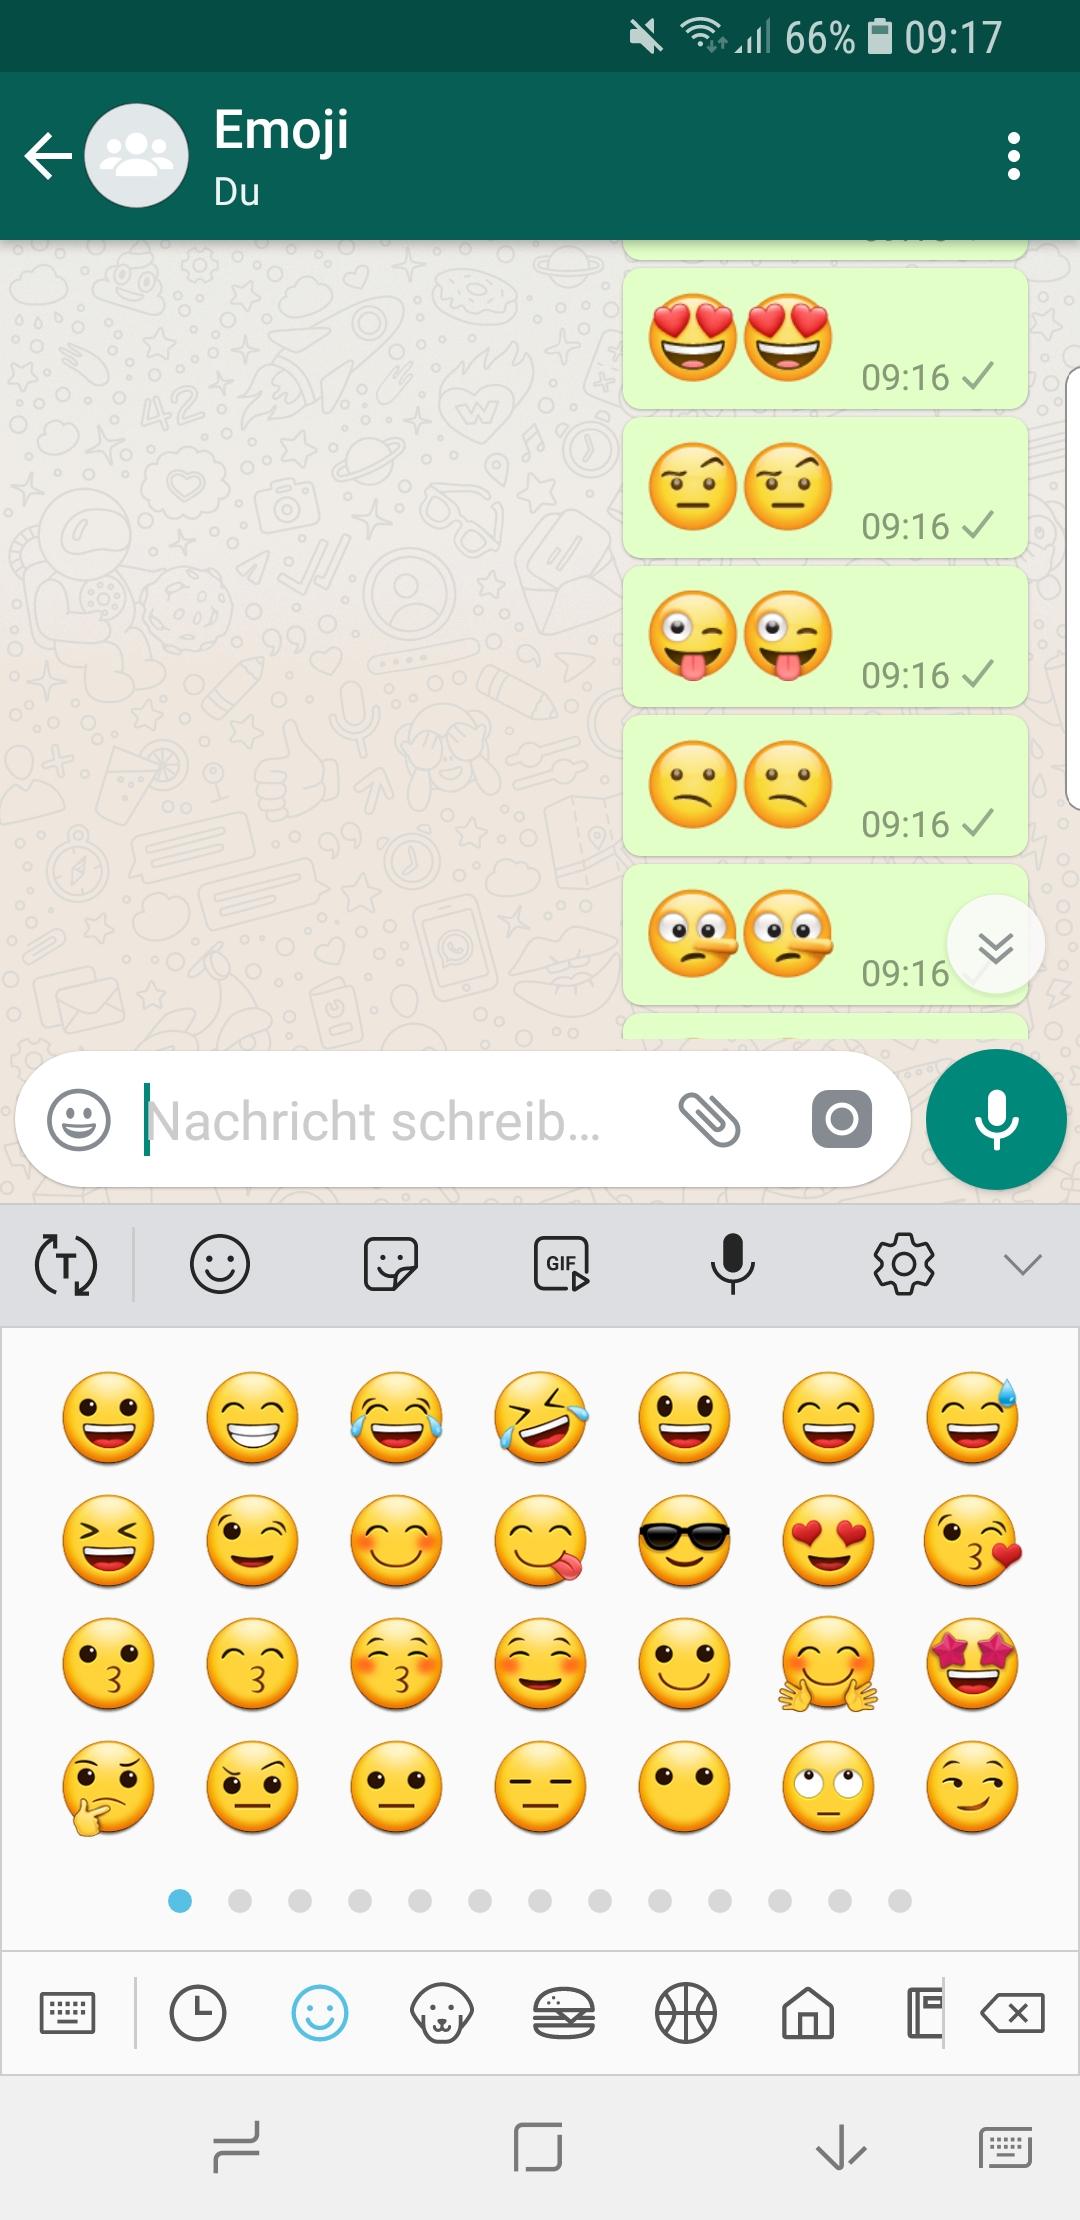 Mehr Emojis Whatsapp